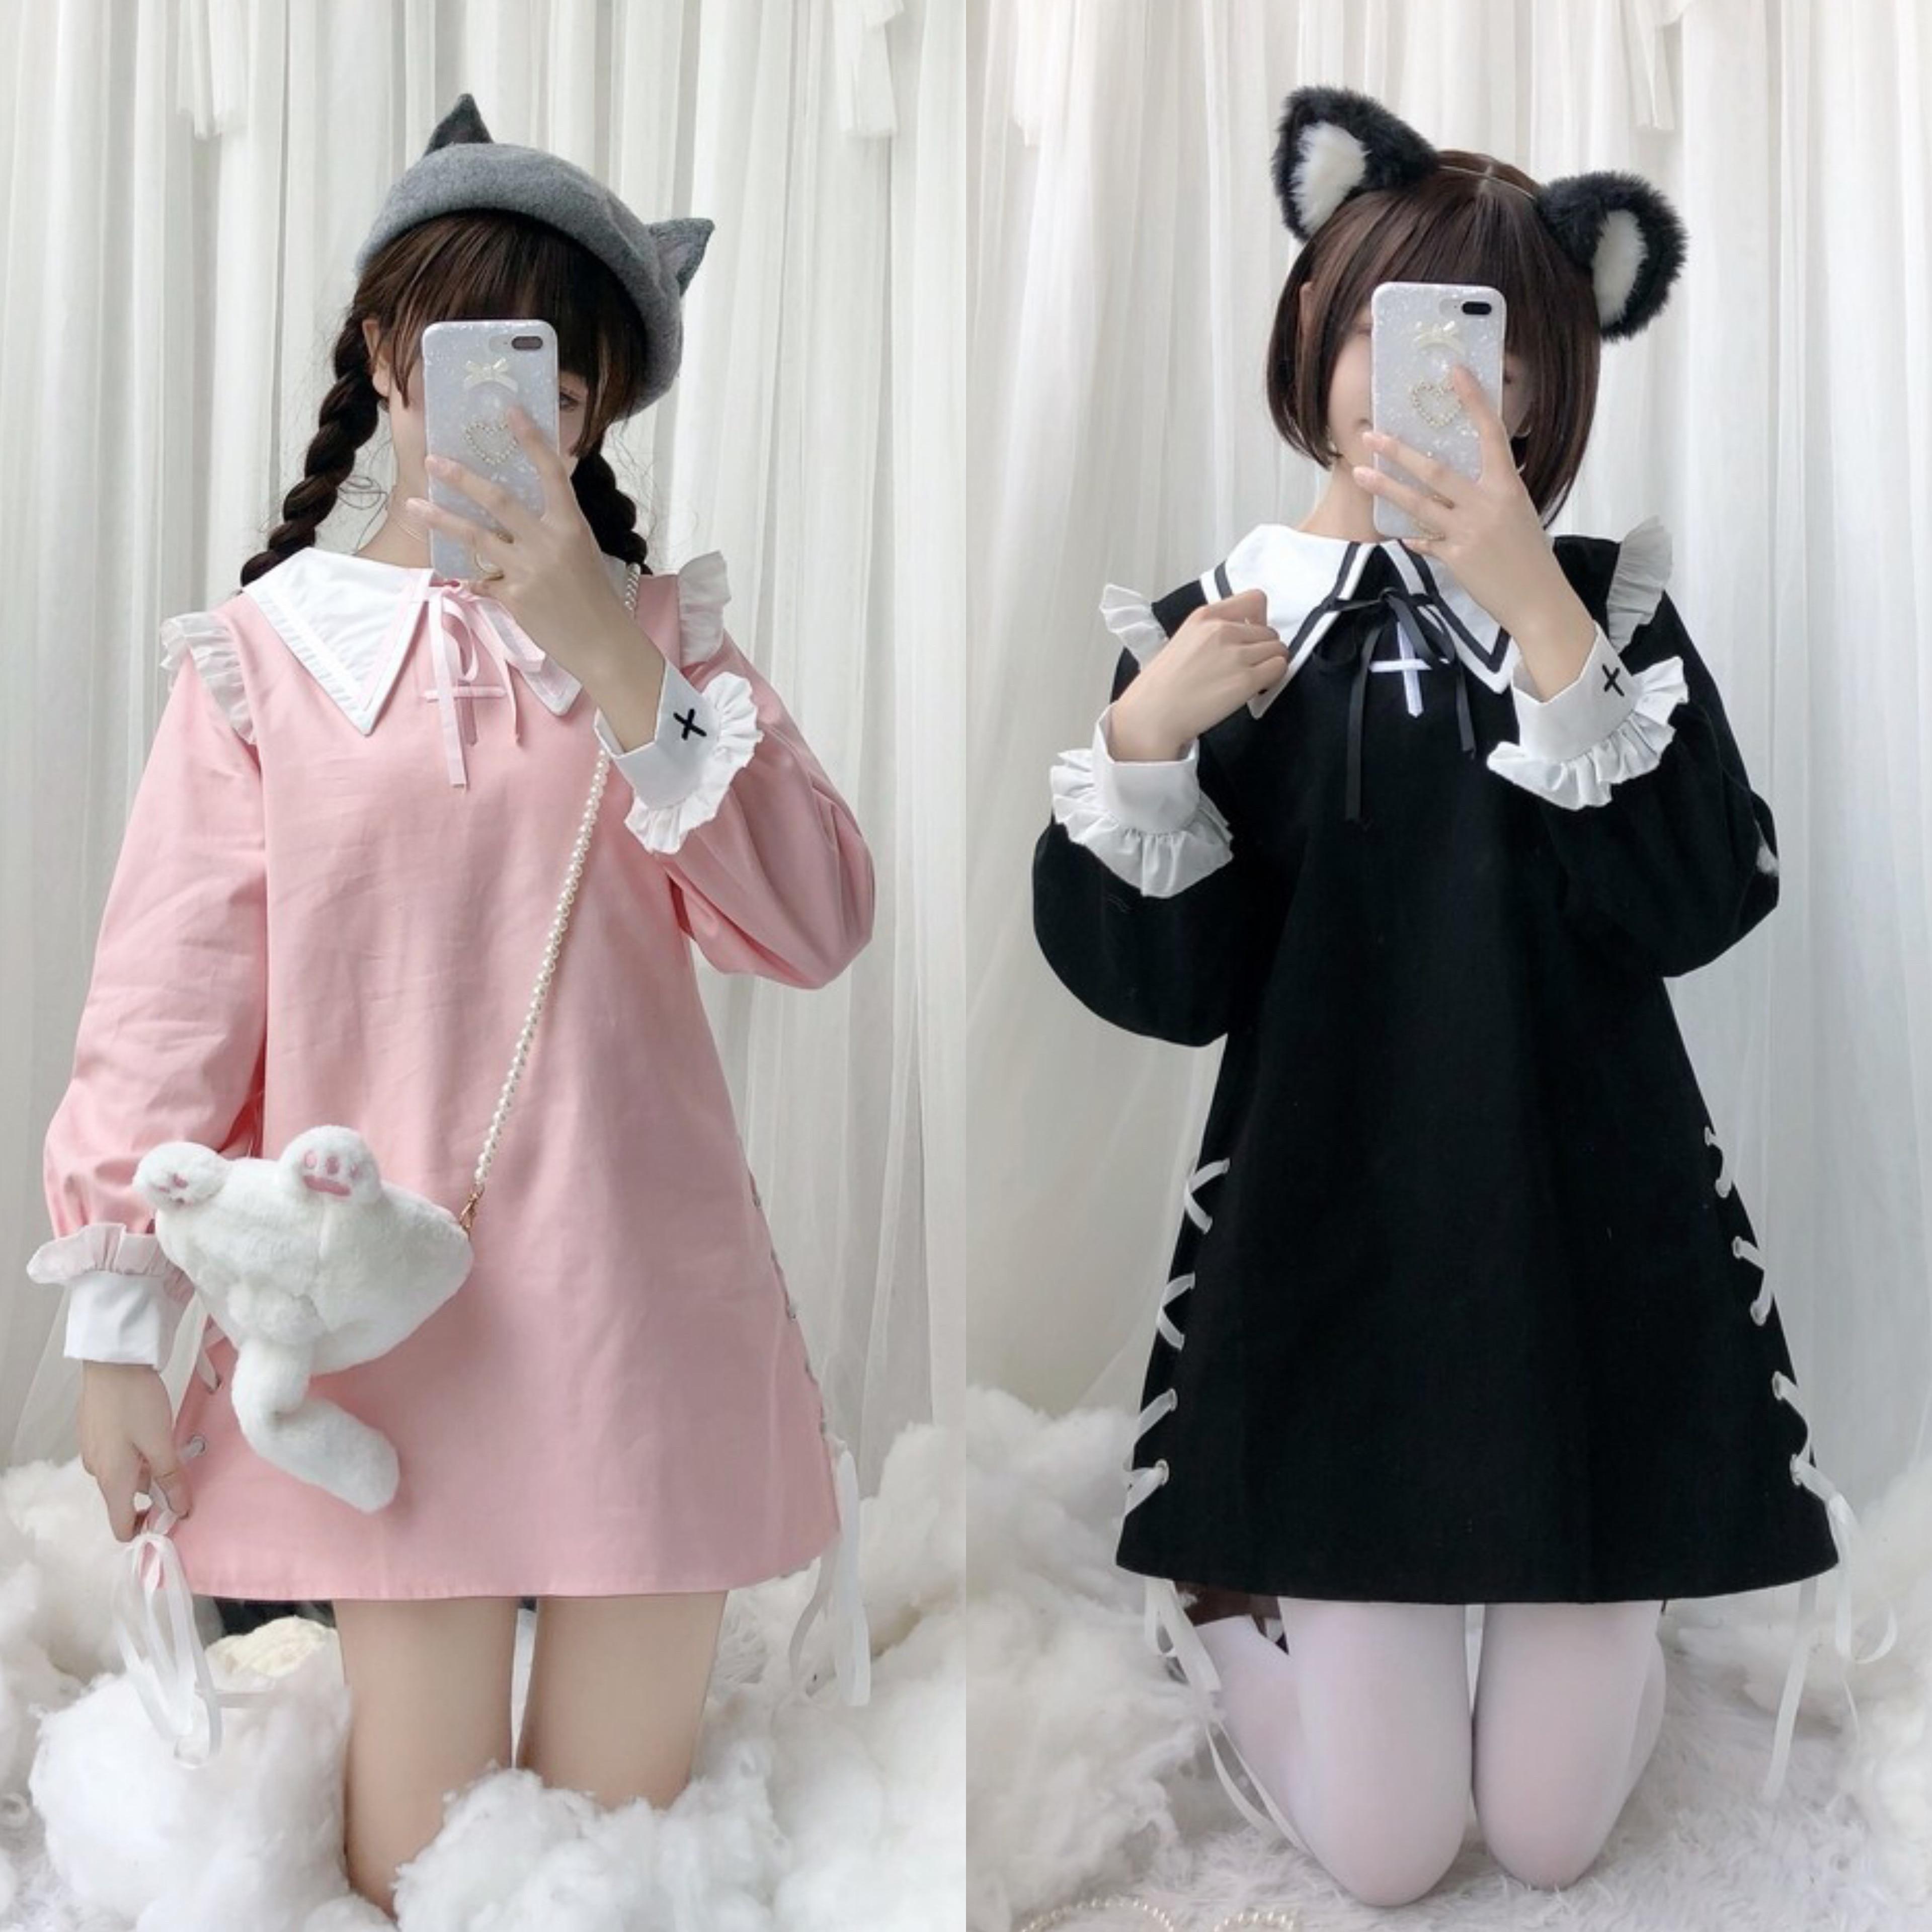 Japonês doce lolita vestido bordado falbala cruz cinta bowknot vitoriano vestido kawaii menina gothic lolita op loli cosplay